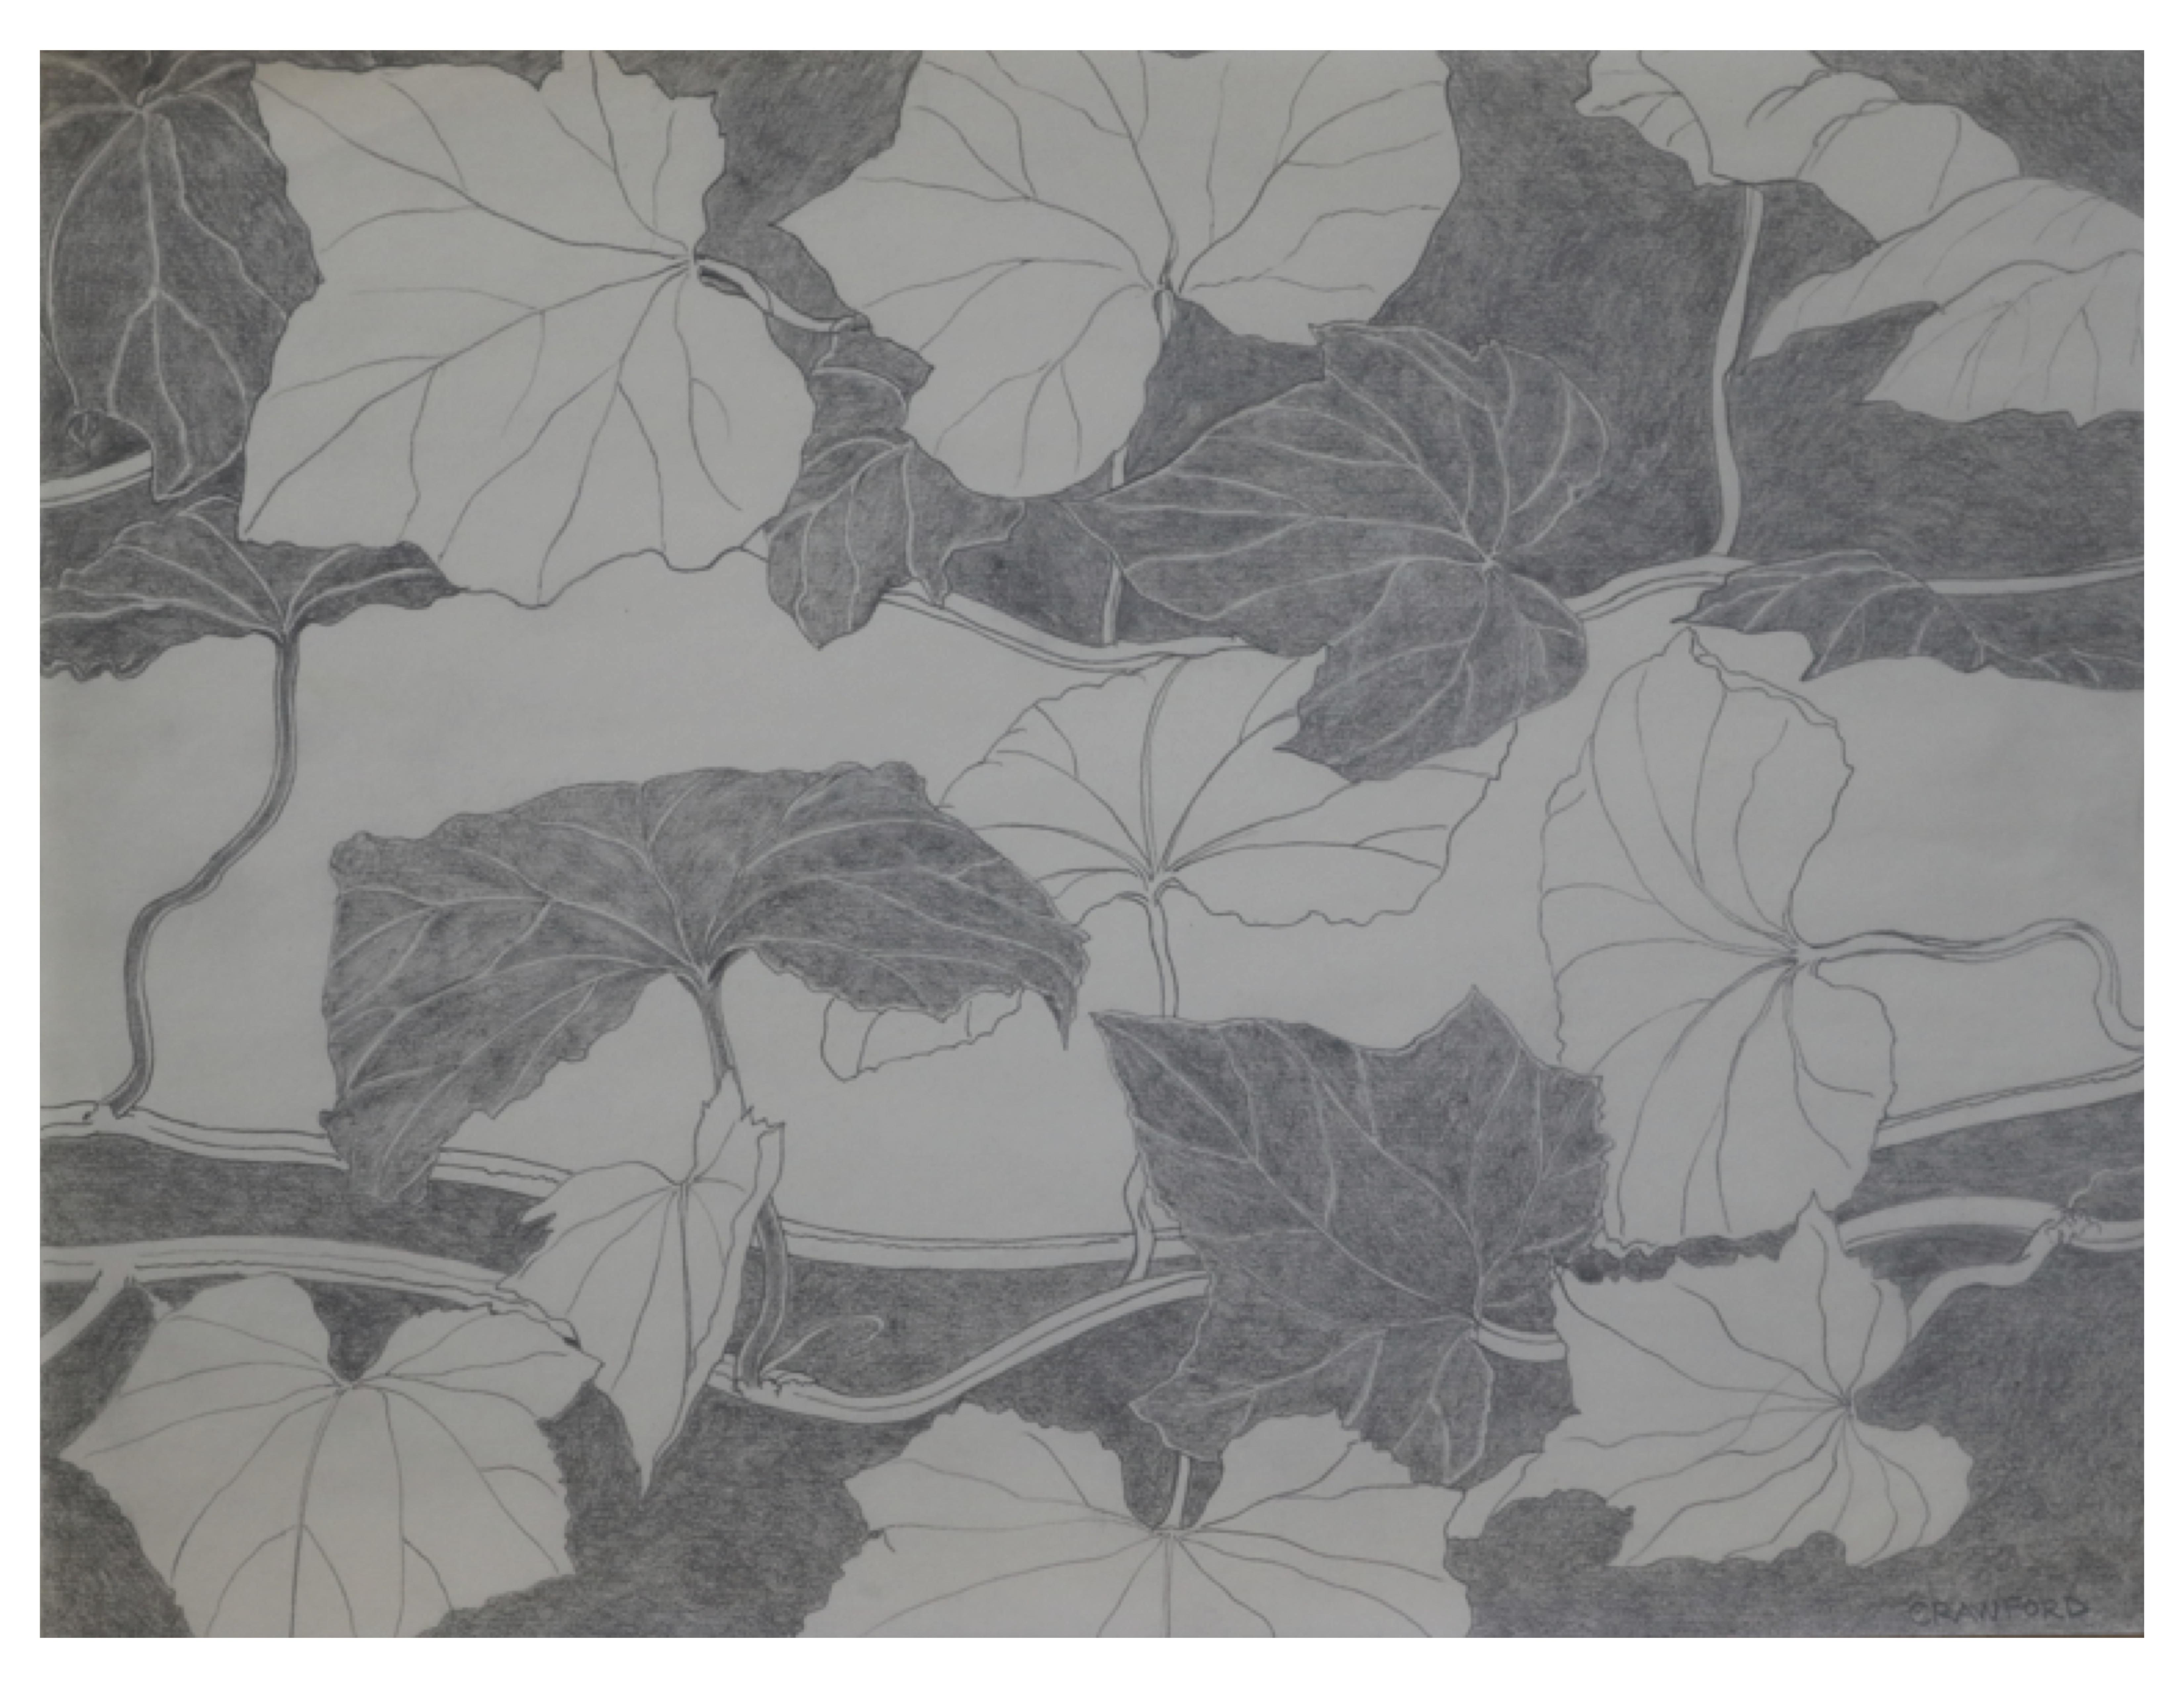 Ivy, Oct 4, 1986, pencil on paper, 27.9 cm x 21.2 cm